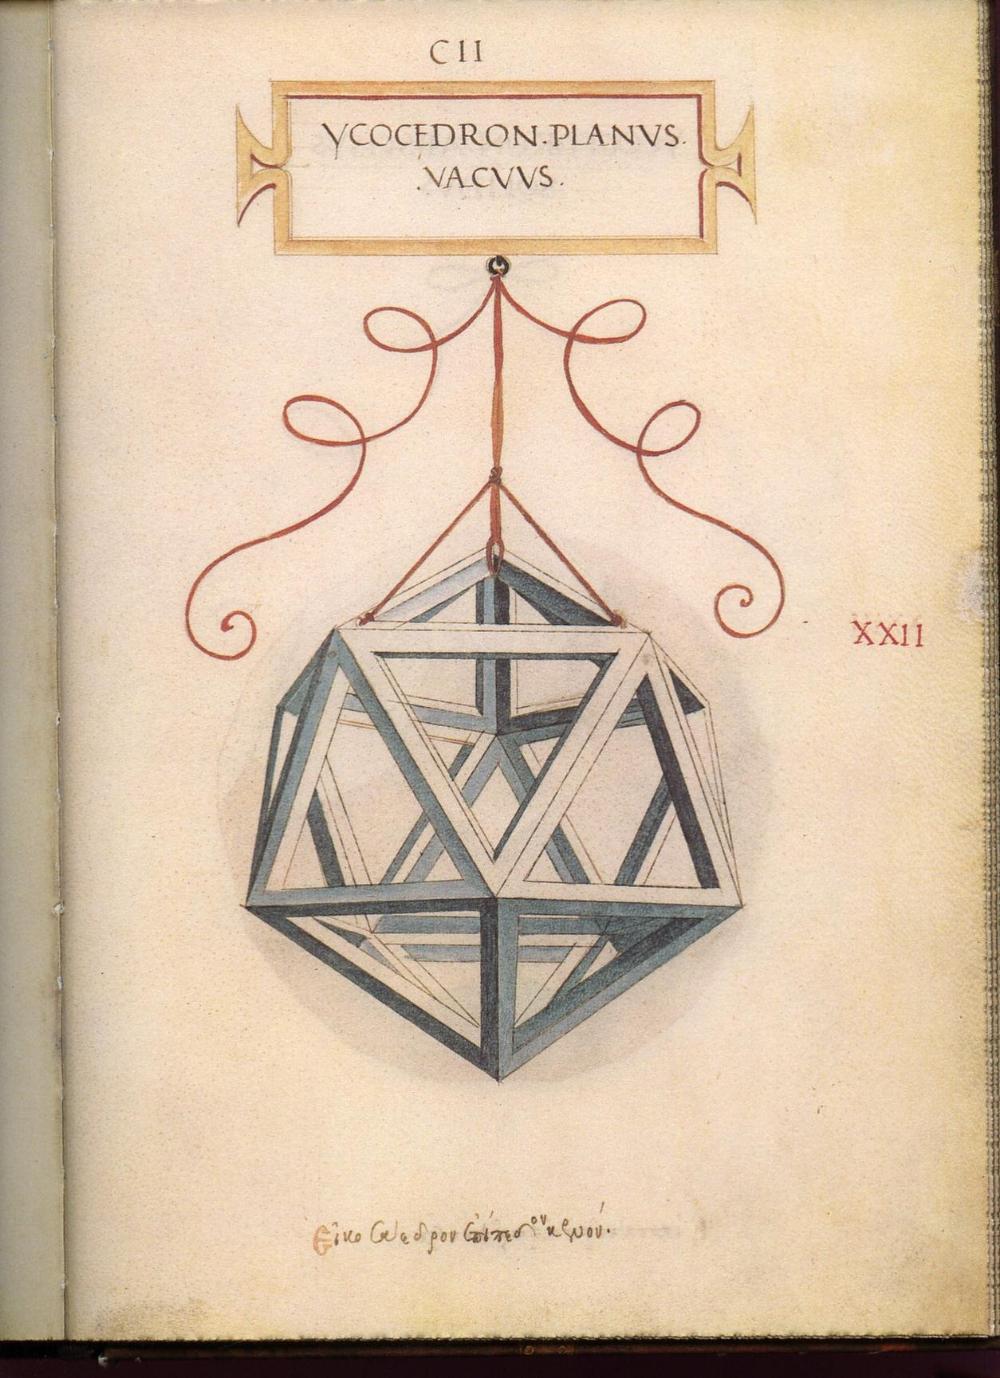 Leonardo Da Vinci S Geometric Sketches Icosahedron Mathematical Association Of America Leonardo Da Vinci Tutorial Legatoria Sezione Aurea